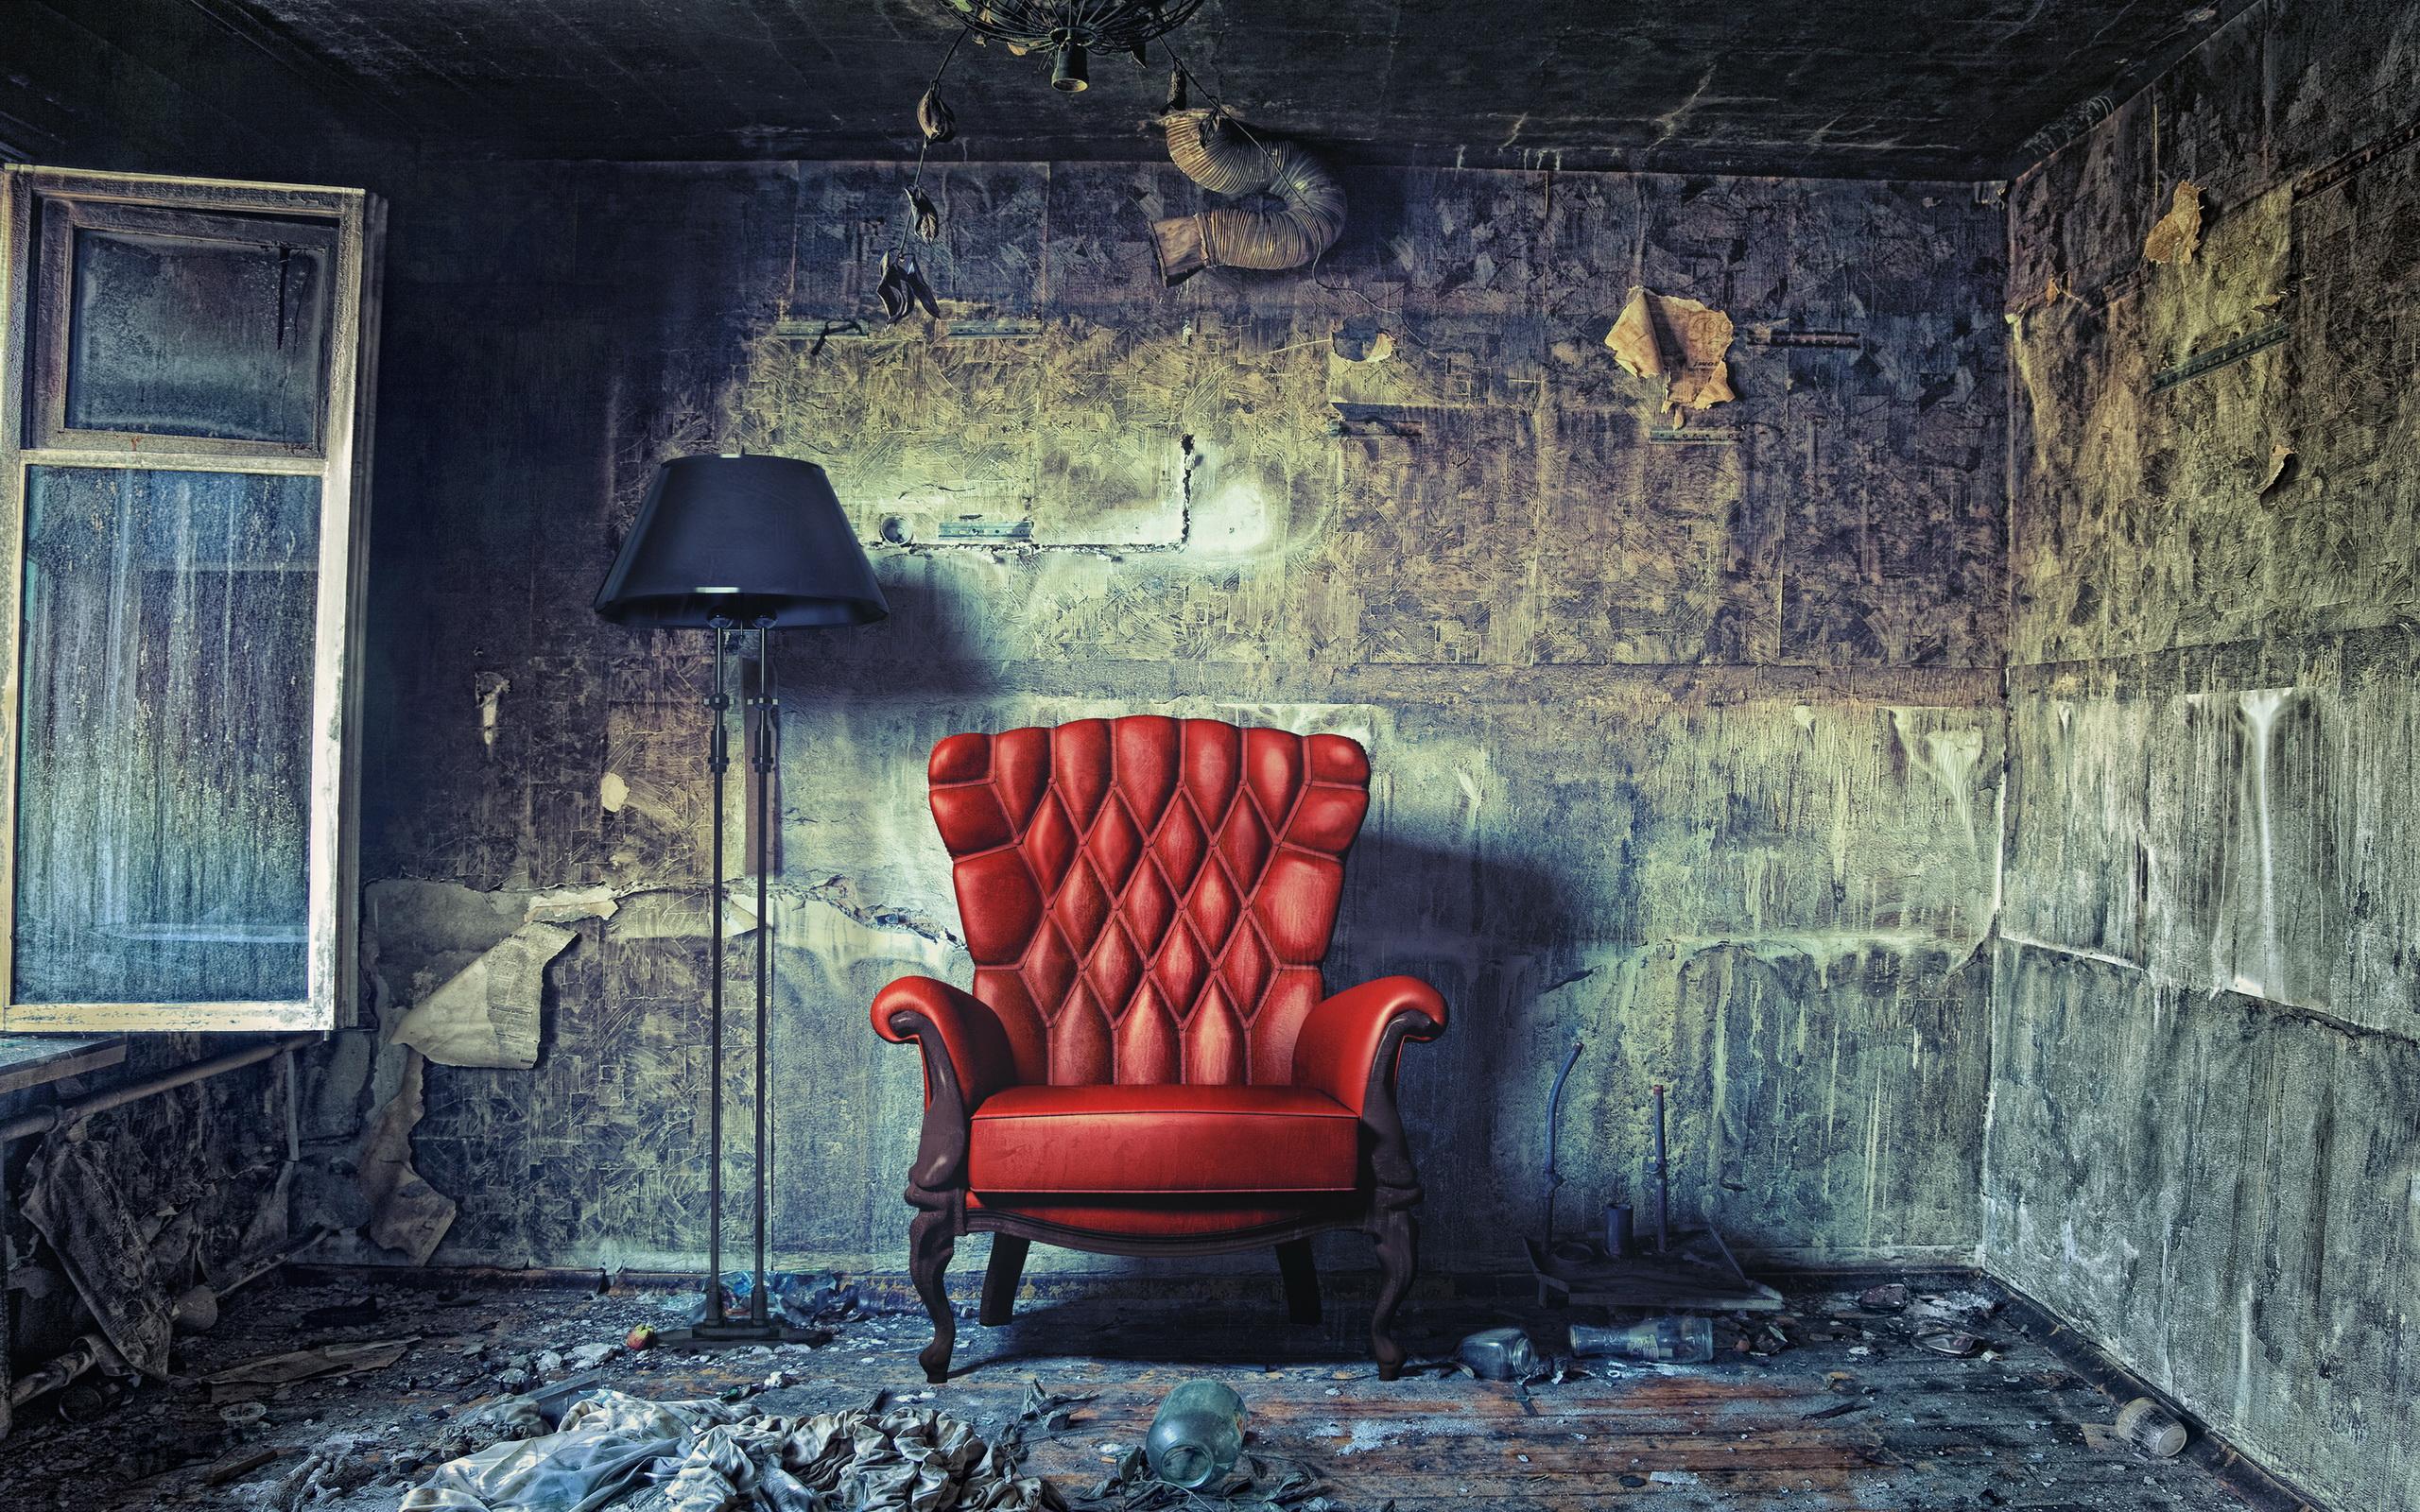 Furniture Hd Wallpaper  Background Image  2560x1600  Id